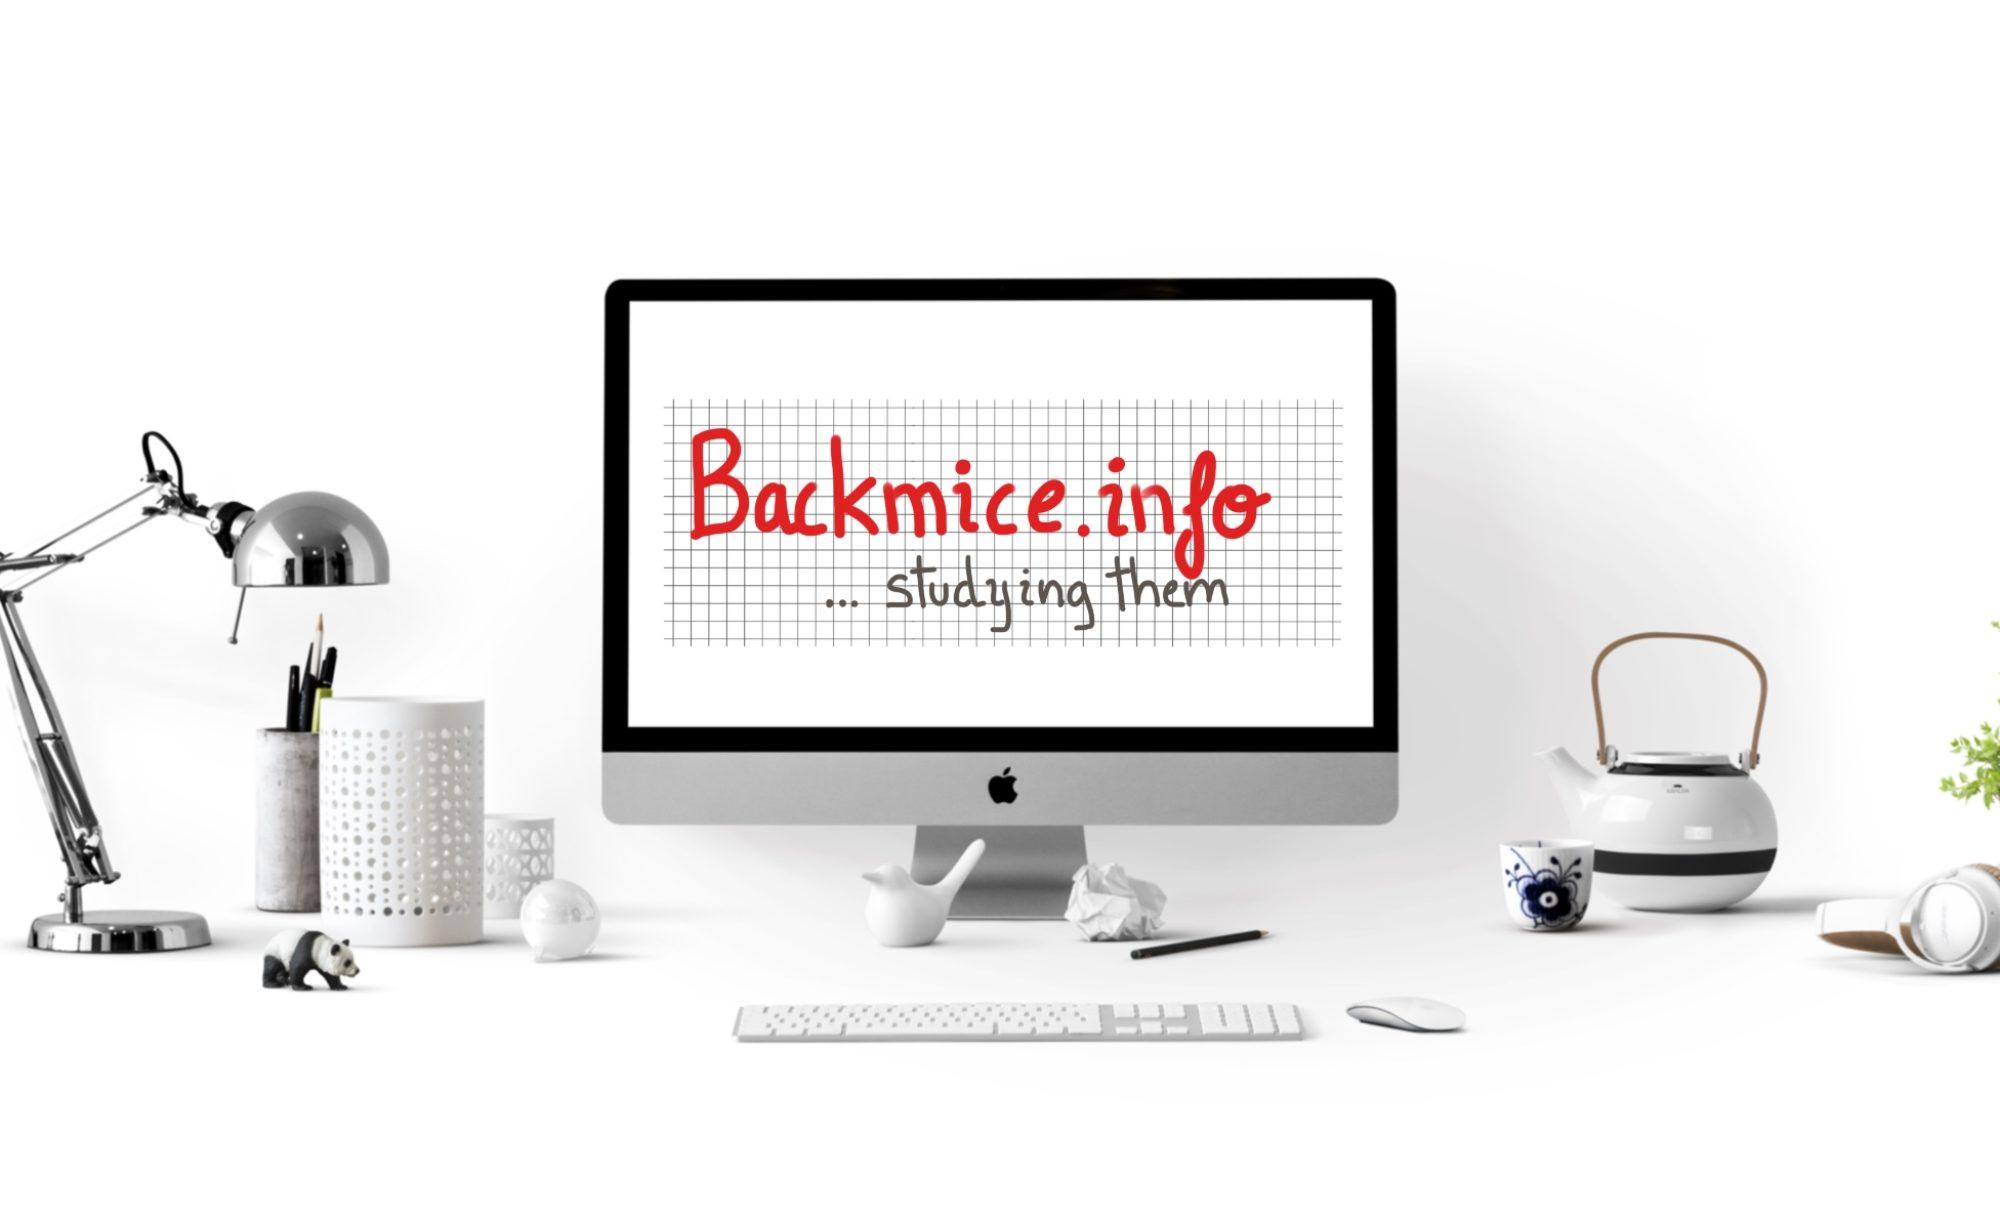 backmice.info